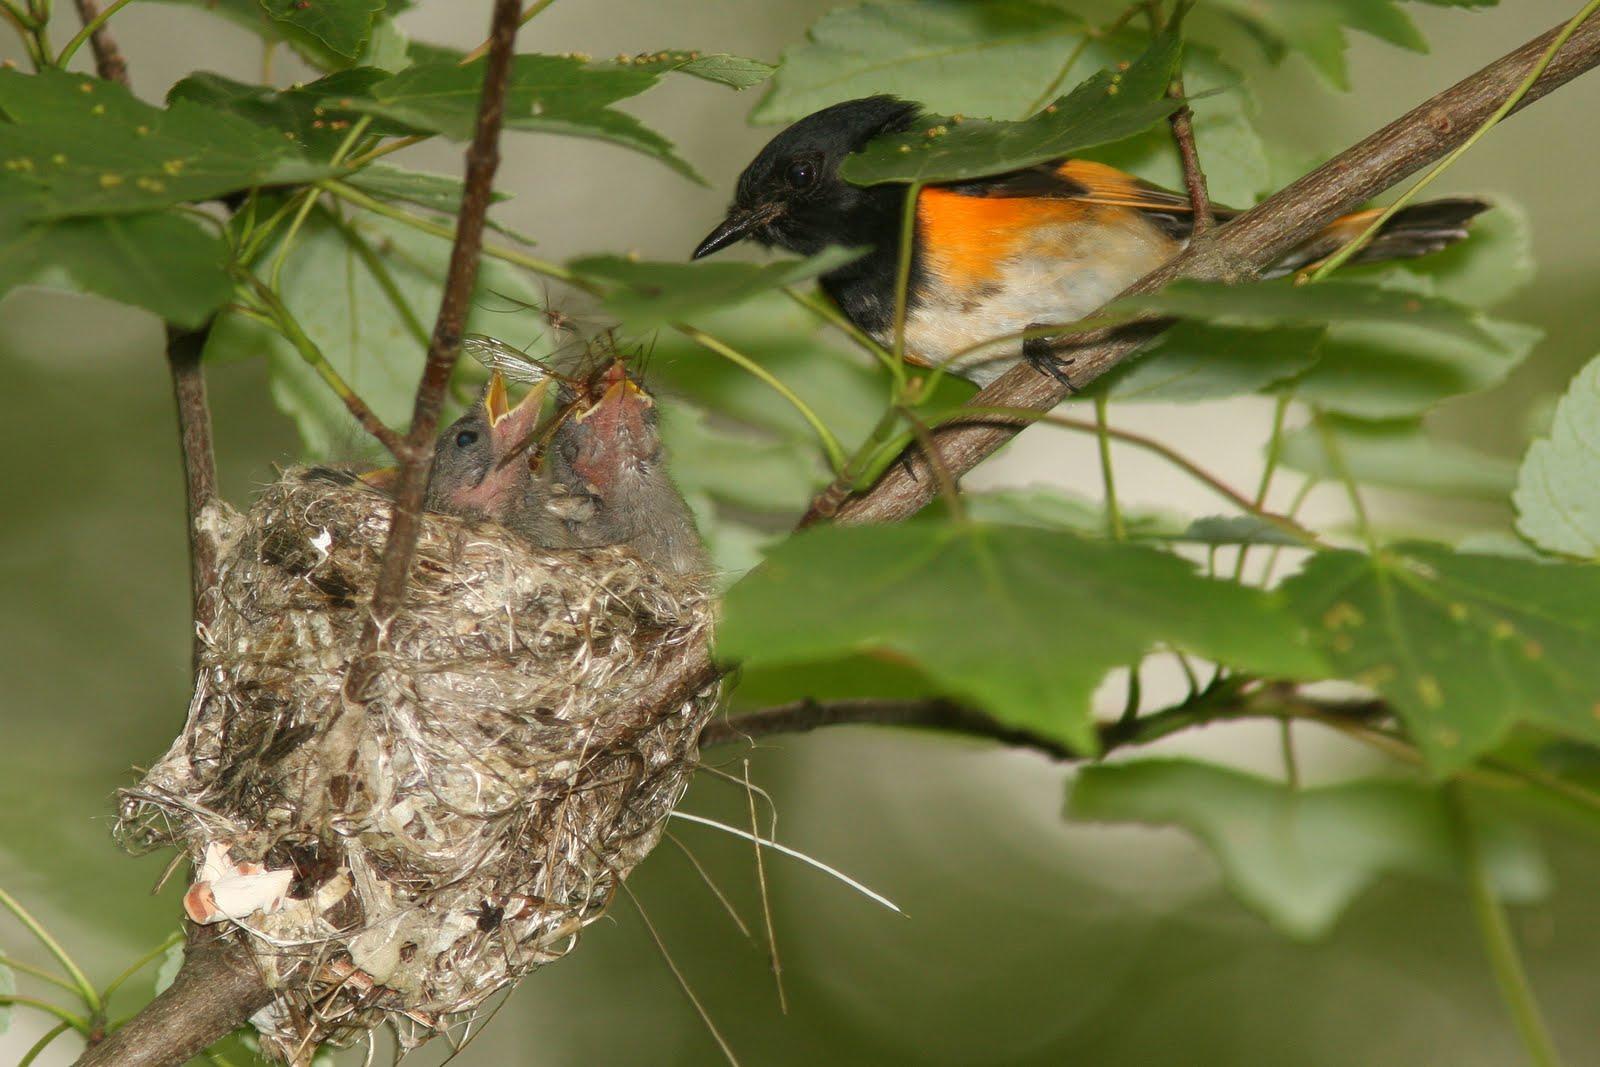 June 2010 in Eagles Nest